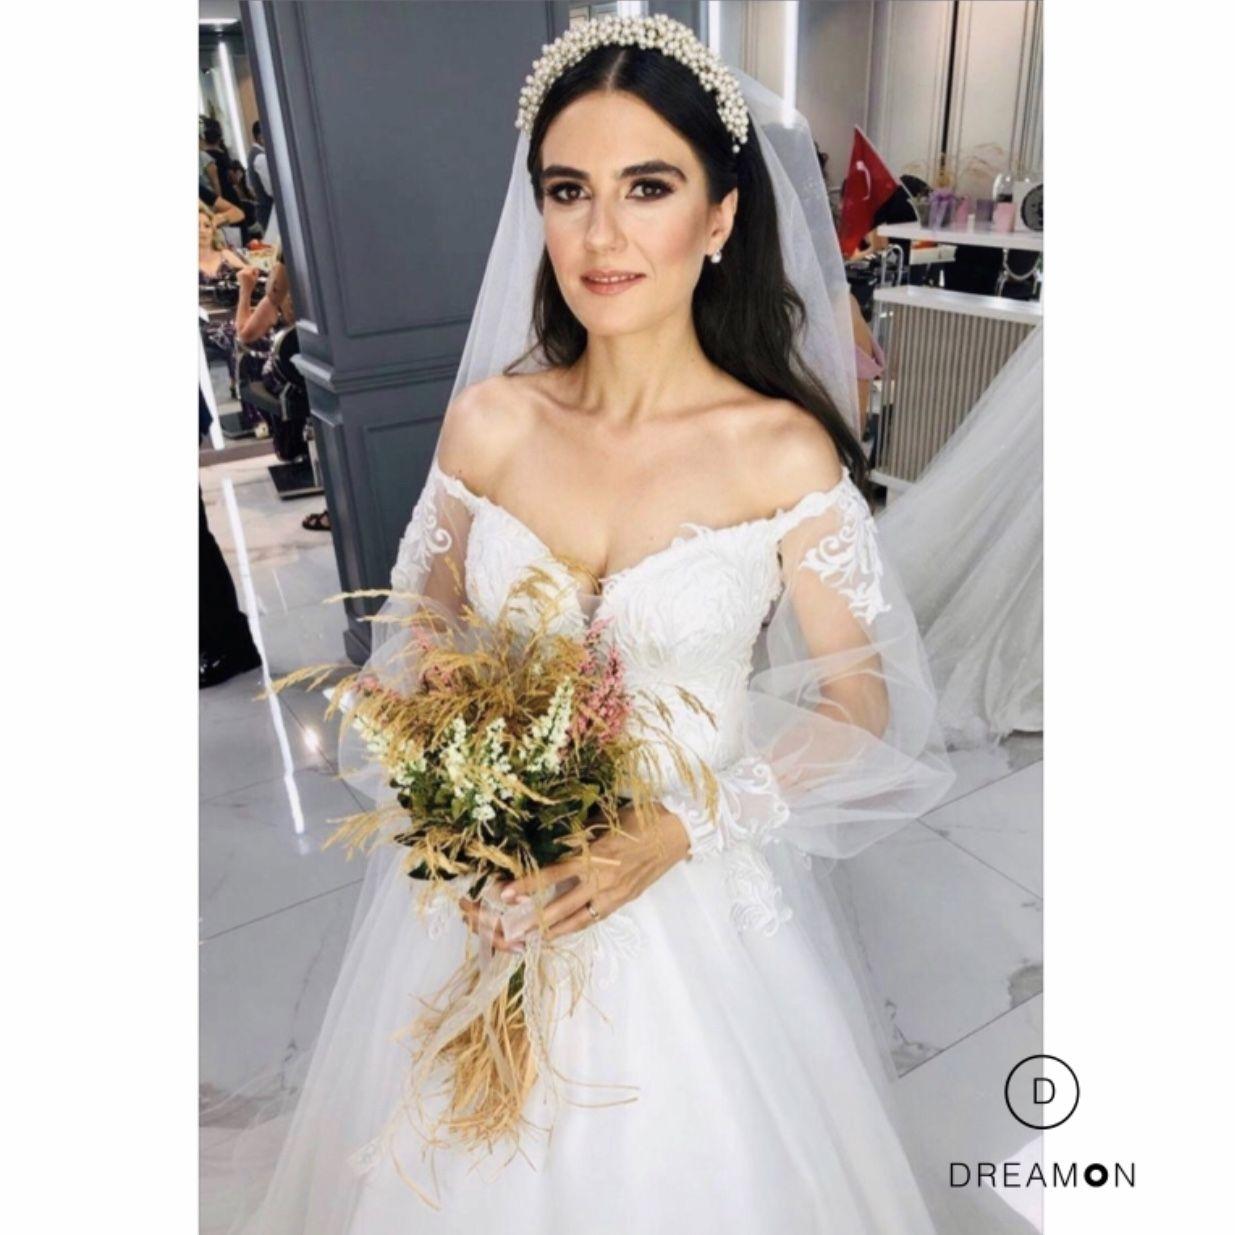 Jacopo Balon Kollu Gogus Dekolteli Helen Gelinlik Modeli Dreamon Com Tr Gelinlik The Dress Dantel Gelinlik